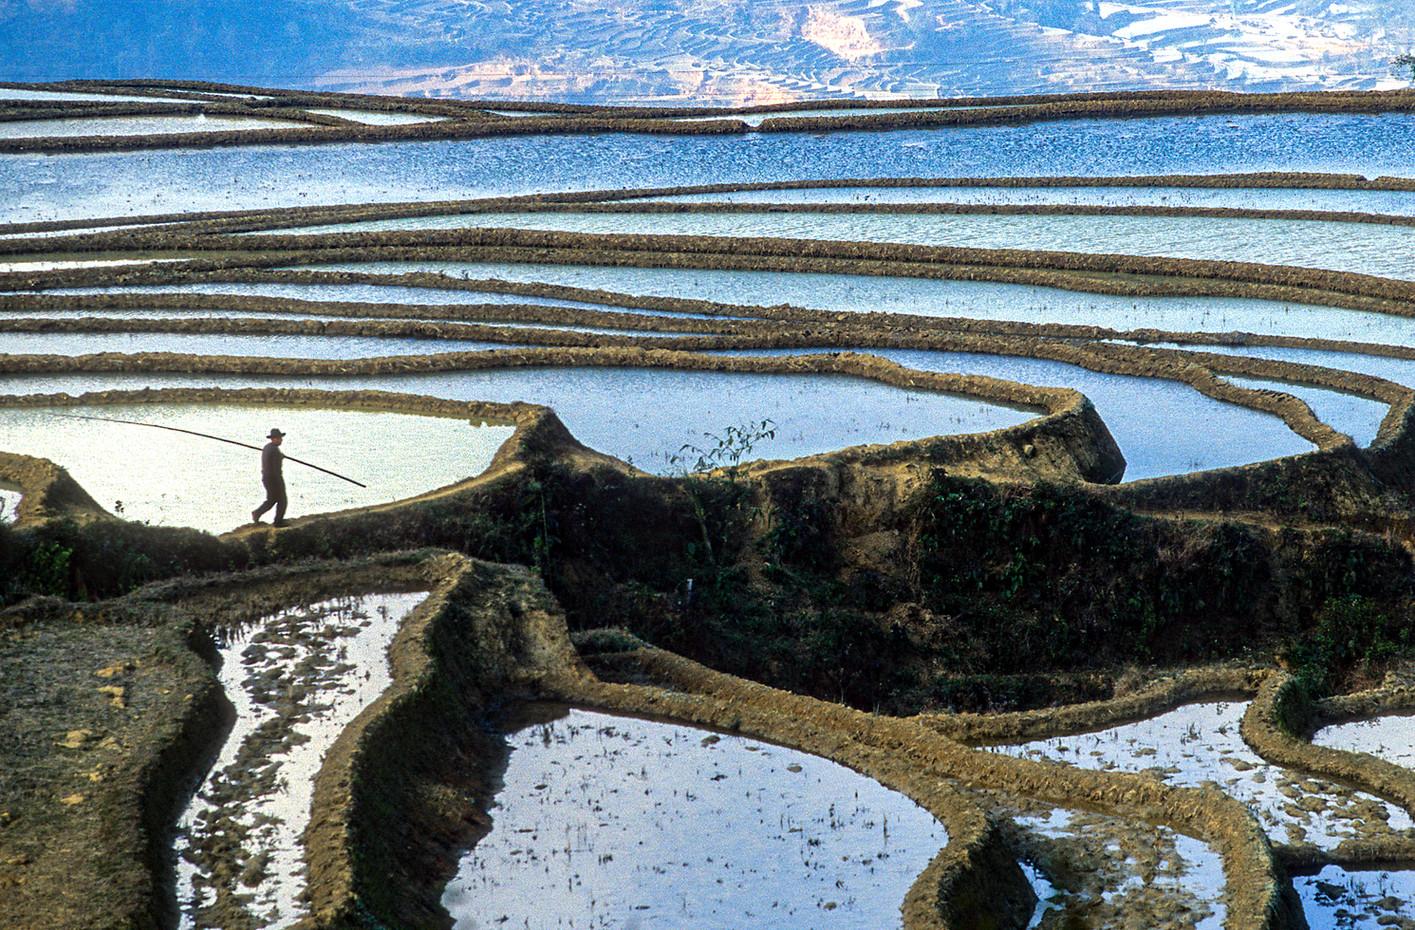 Rice terraces & farmer in Yuanyang, China